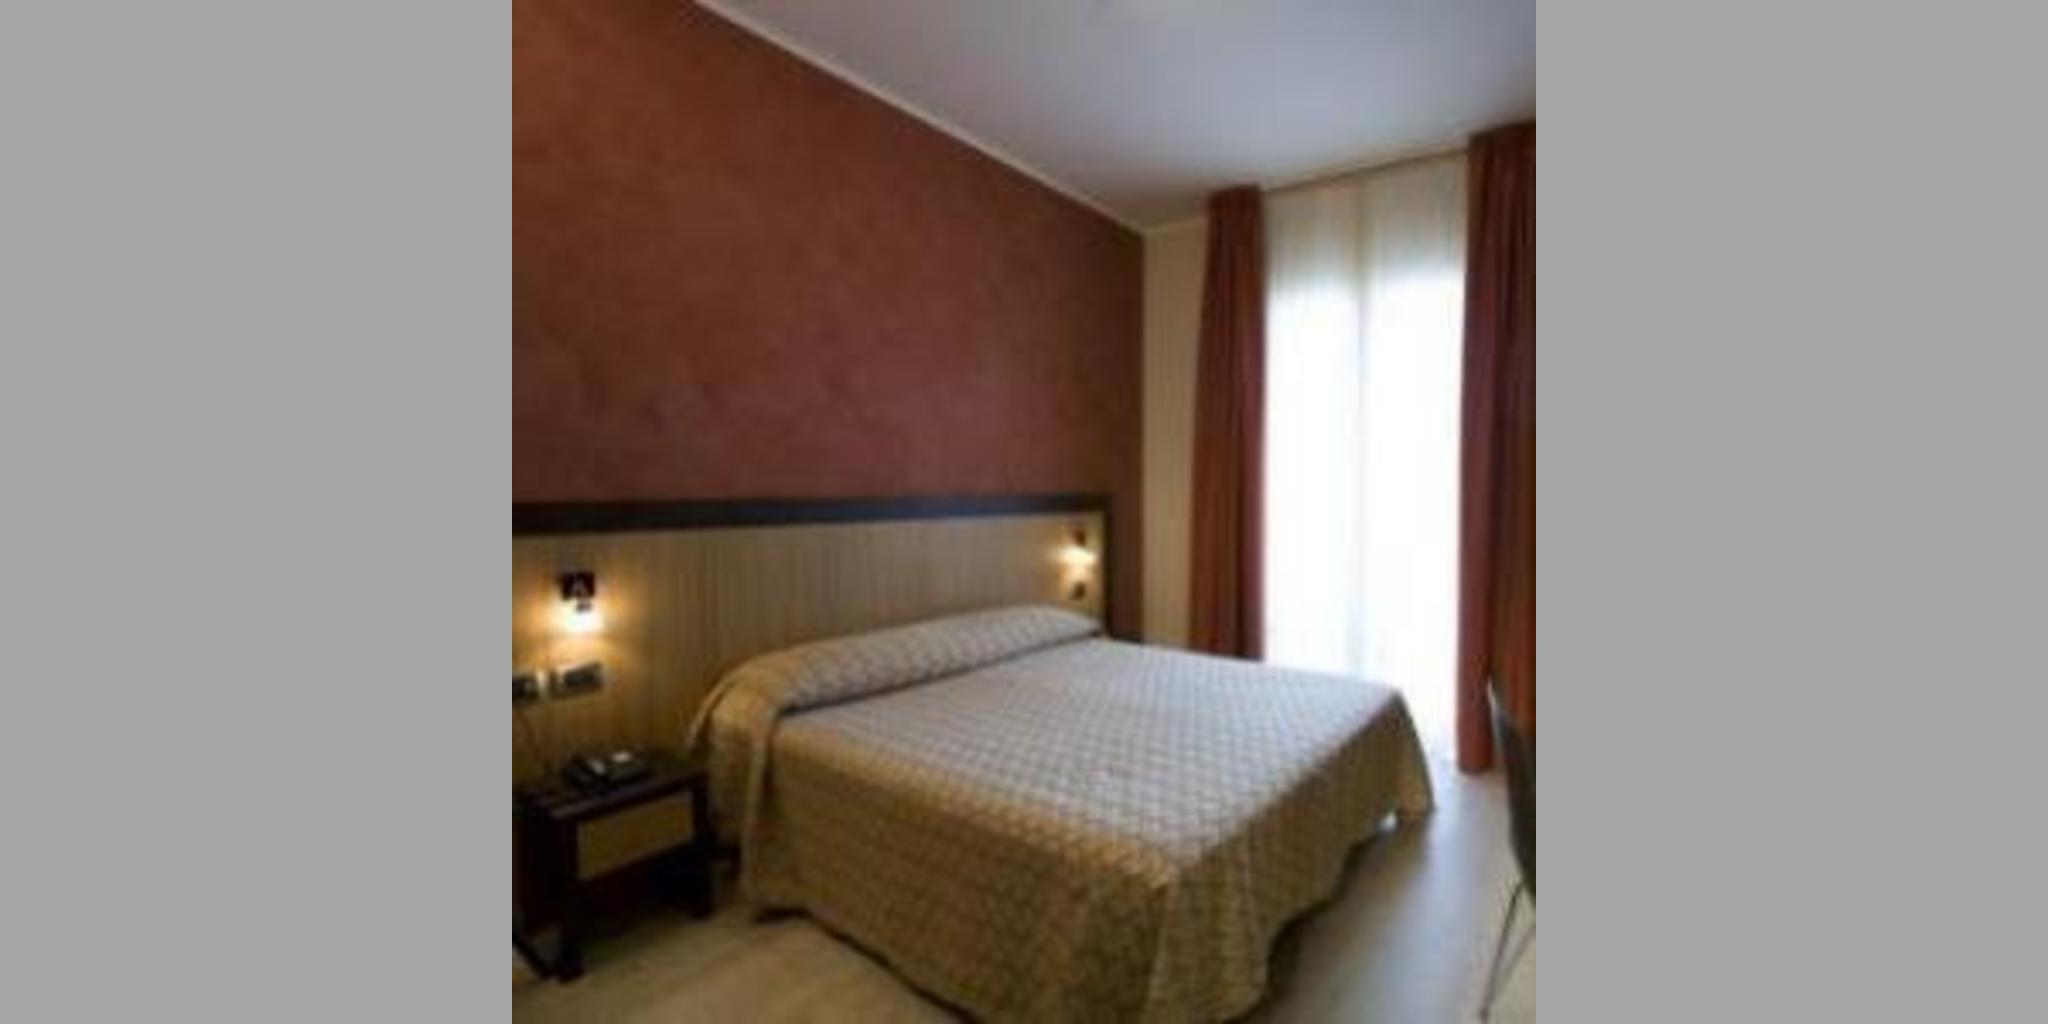 Hotel Cutrofiano - Cutrofiano